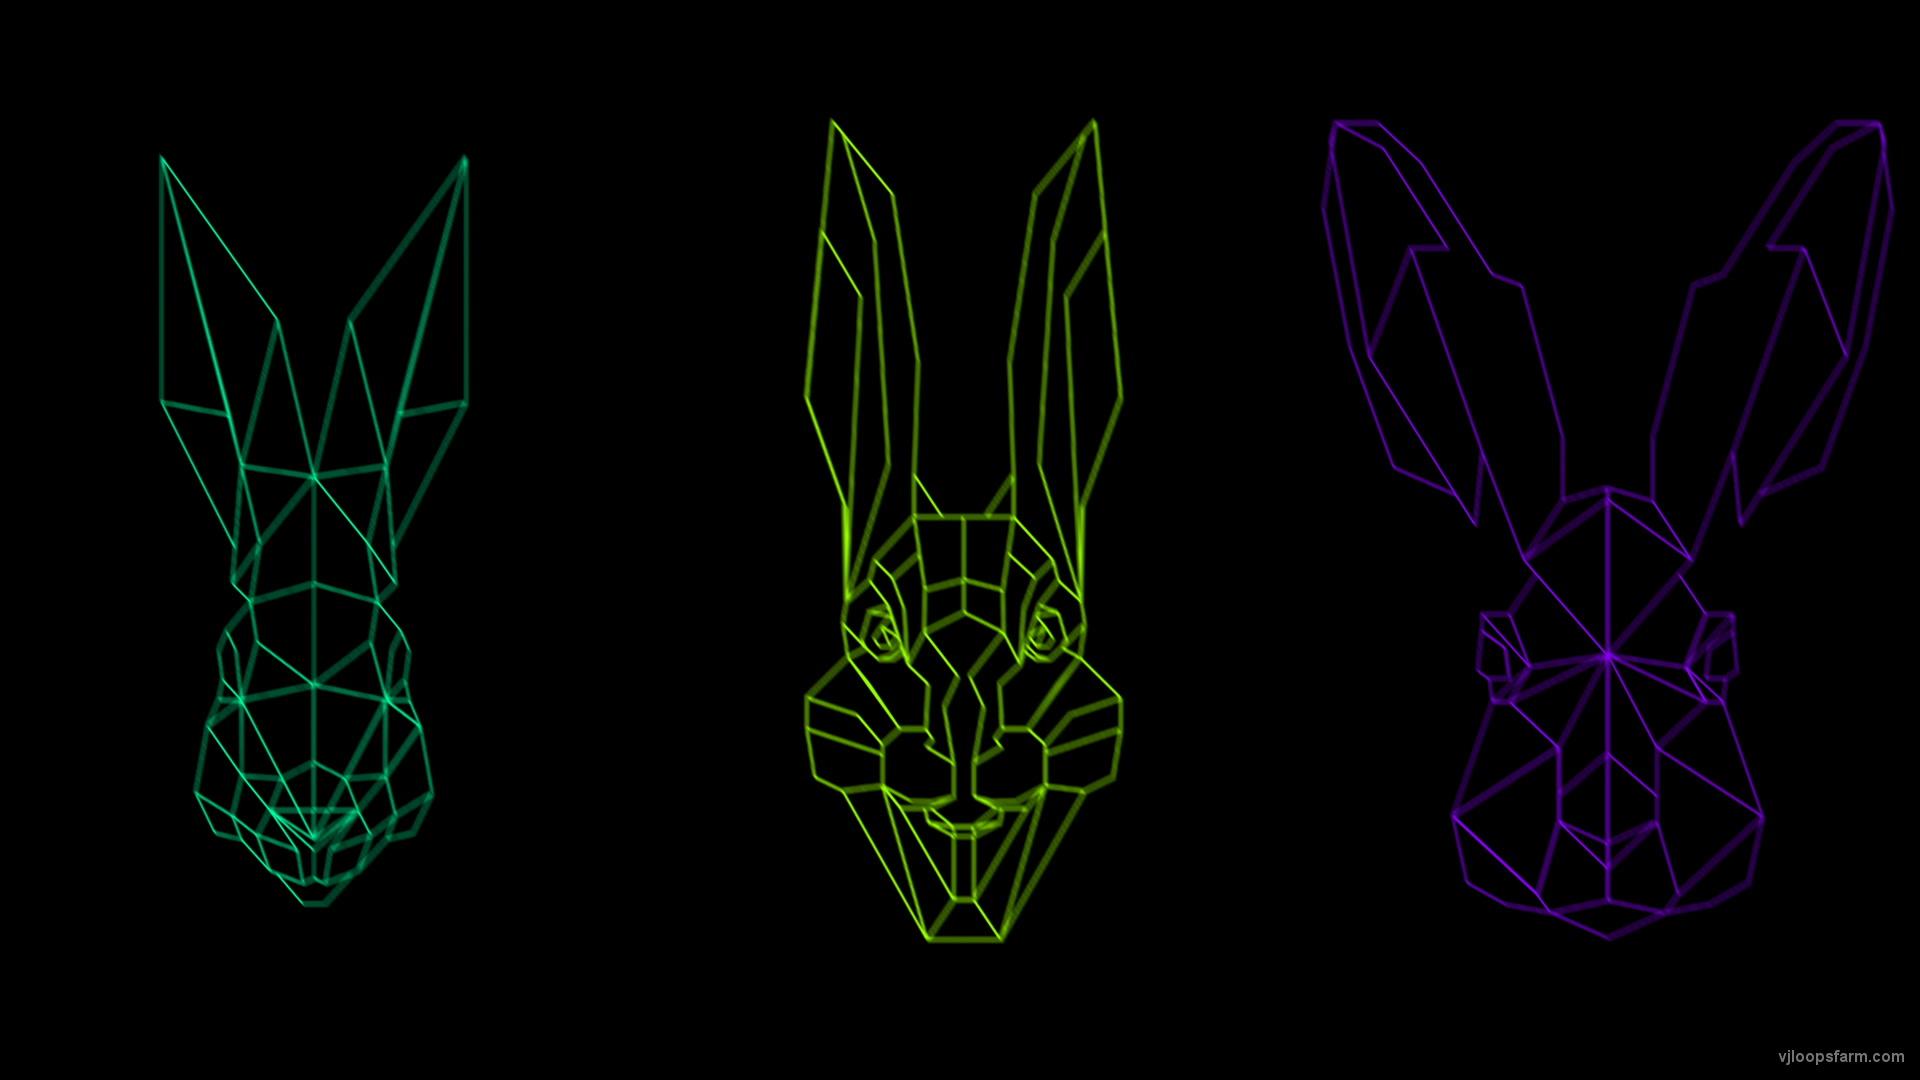 vj video background Rabbit-Vita-VJ-Loop-NEKTARDIGITAL-3_003